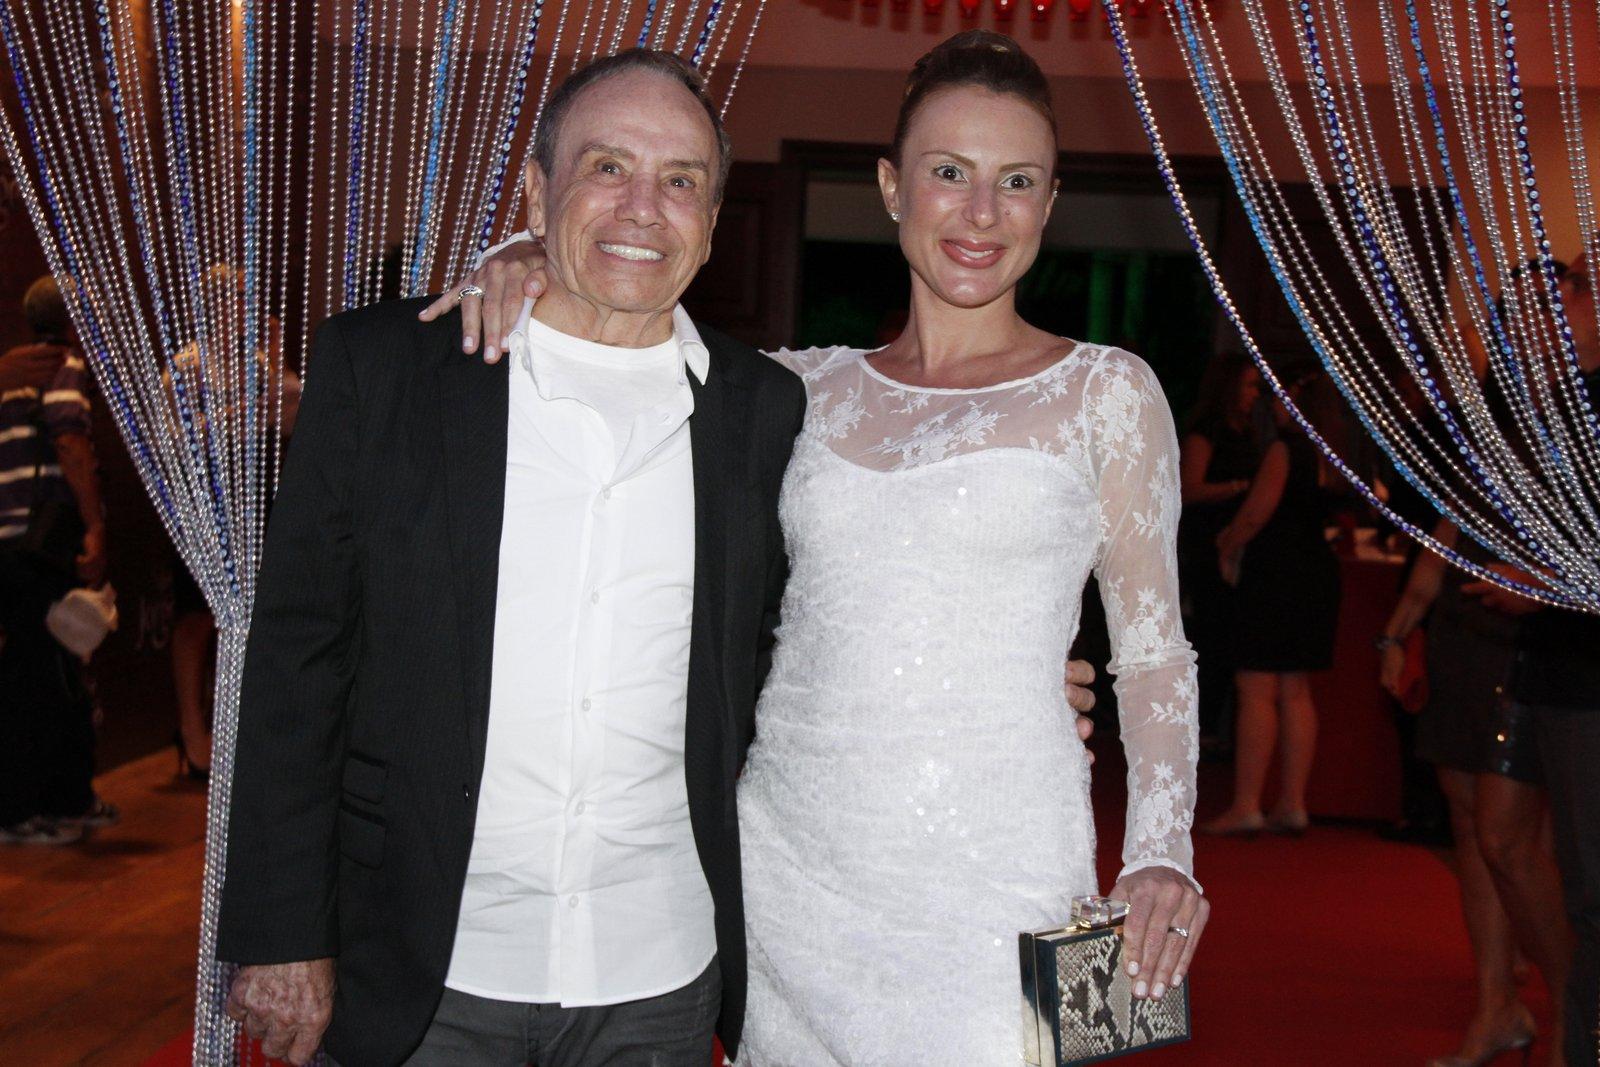 Stênio Garcia e a mulher, Marilene Saad